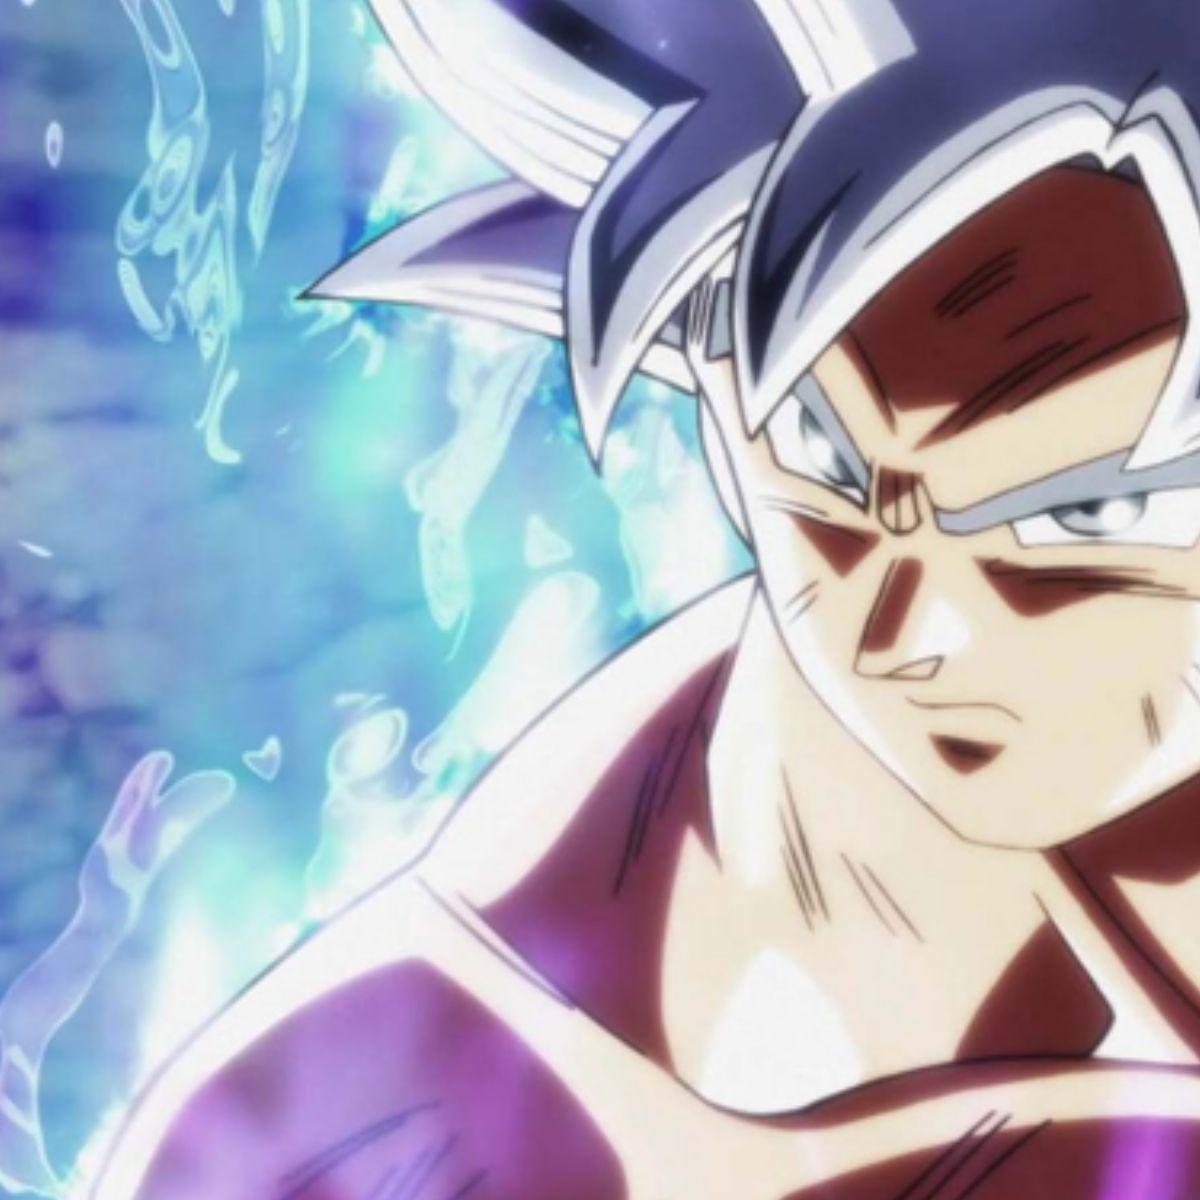 Dragon Ball Fighterz Une Premiere Image De Goku Ultra Instinct Diffusee